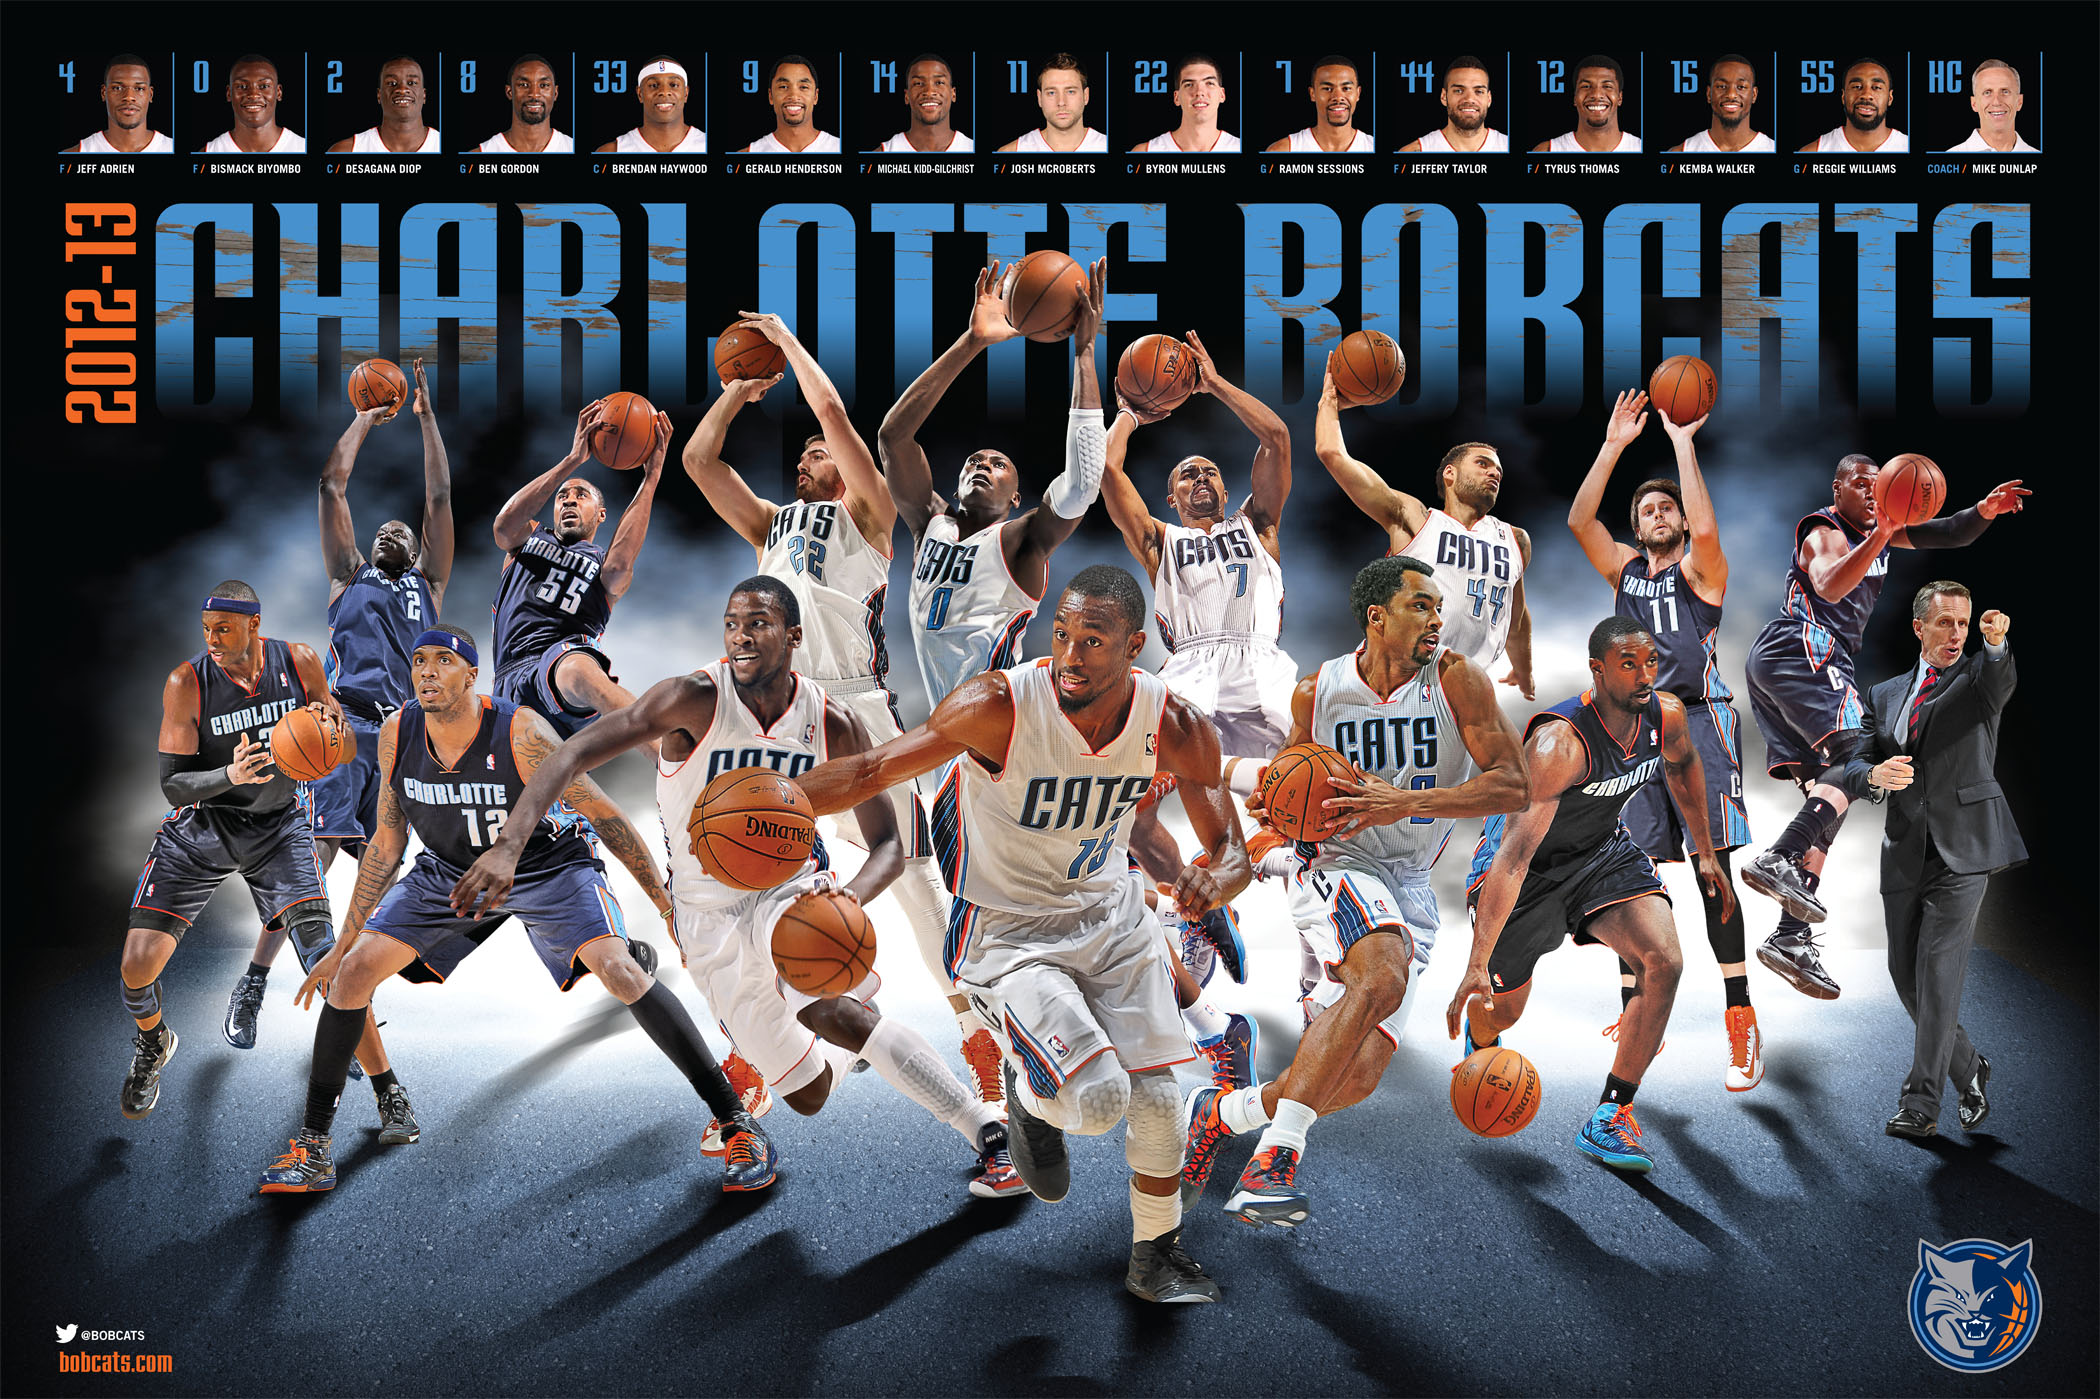 Charlotte Bobcats Nba Basketball 20 Wallpaper 2100x1399 226780